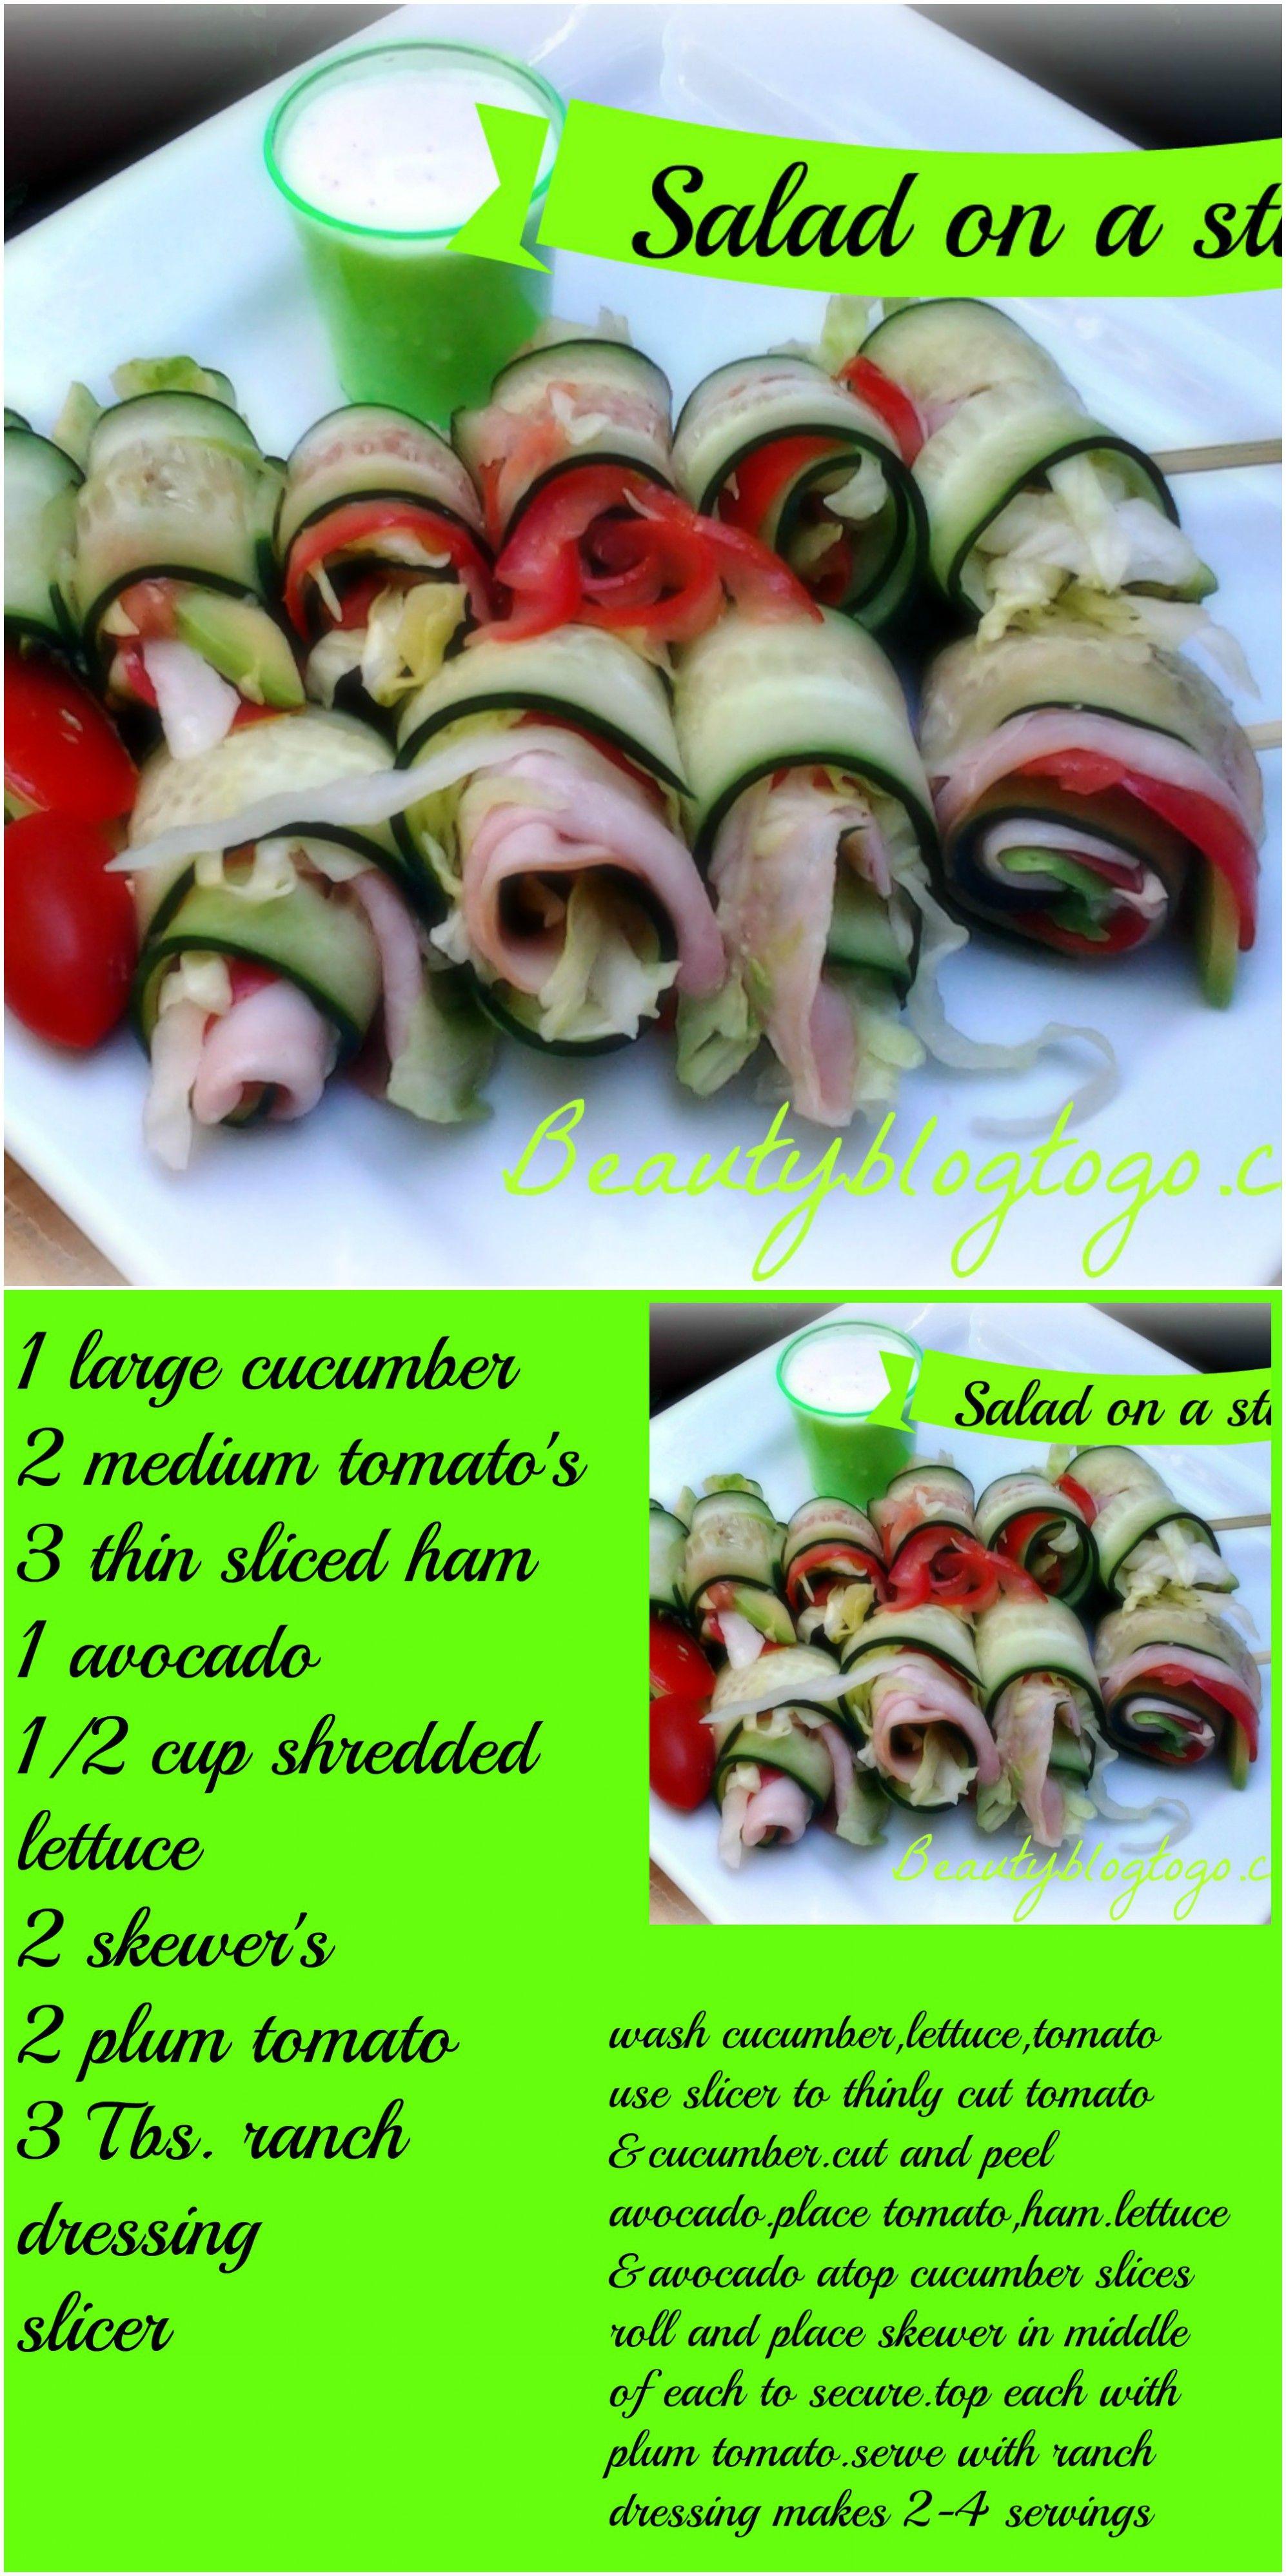 Beautyblogtogo salad cucumber healthy food recipes post your beautyblogtogo salad cucumber healthy food recipes forumfinder Choice Image